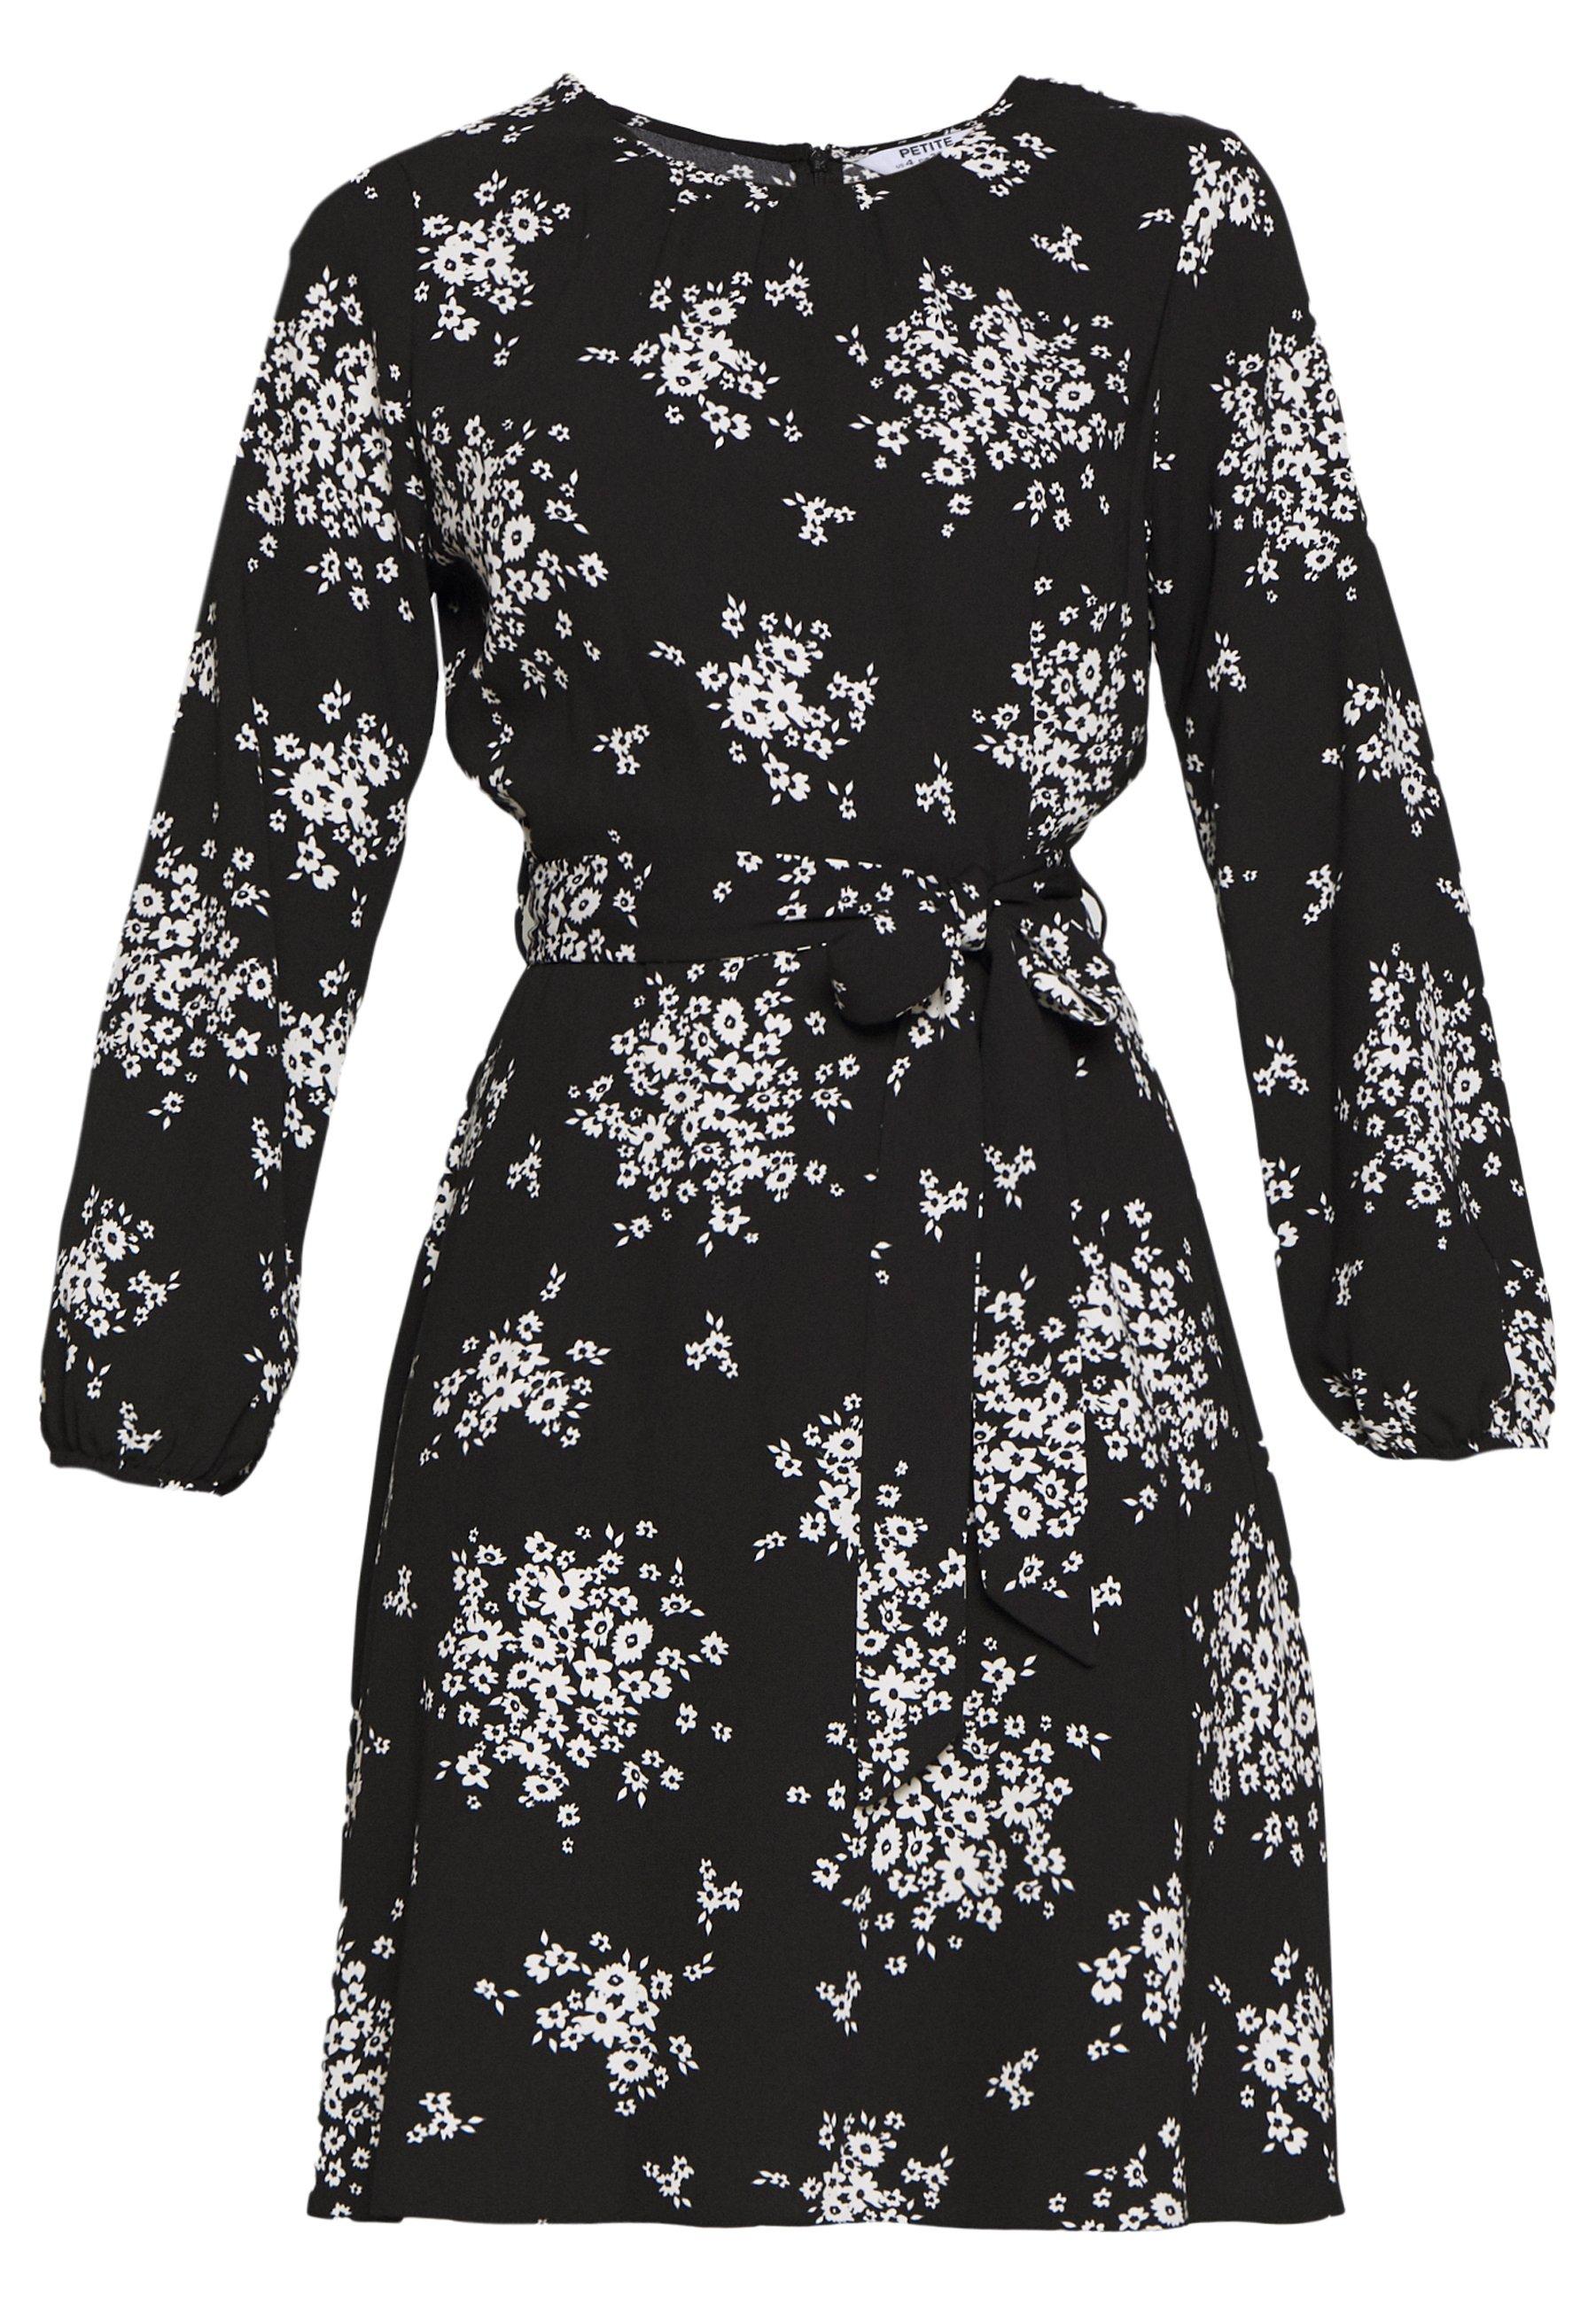 Dorothy Perkins Petite Petites Mono Cluster Floral Long Sleeve Fit And Flare Dress - Vardagsklänning Black